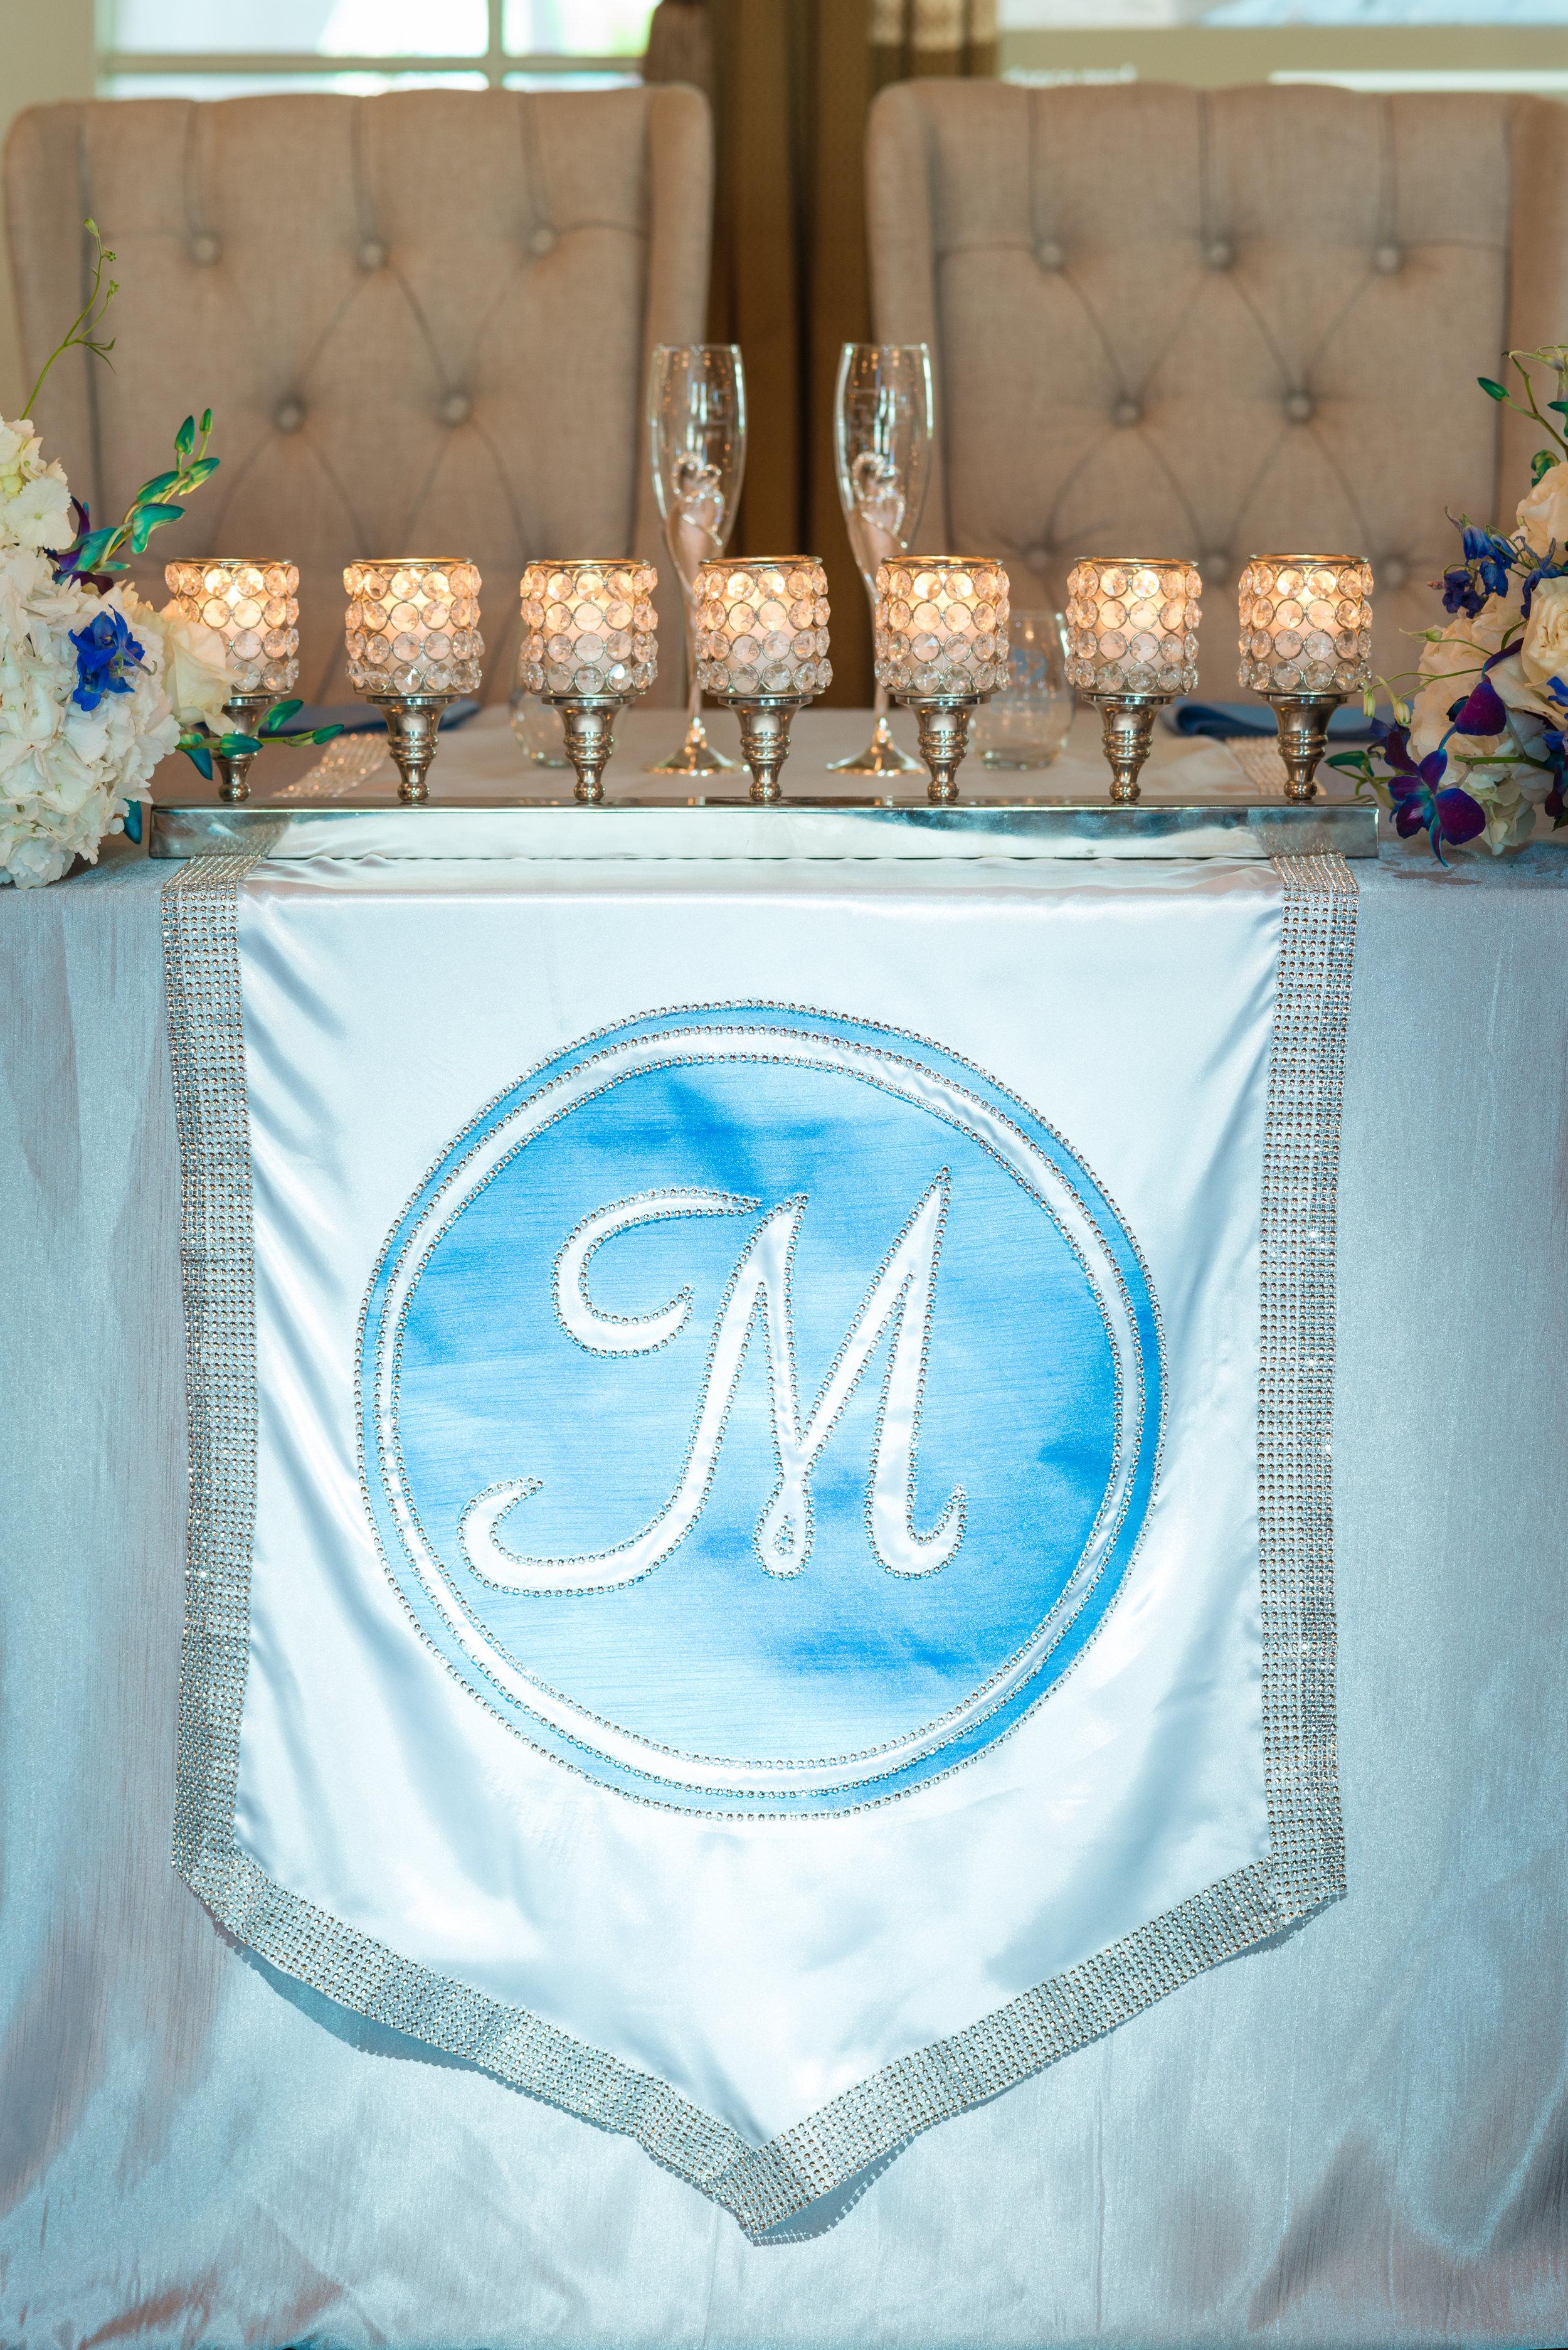 Carl-Kerridge-Photography-North-Beach-Wedding-May-2015-007.jpg